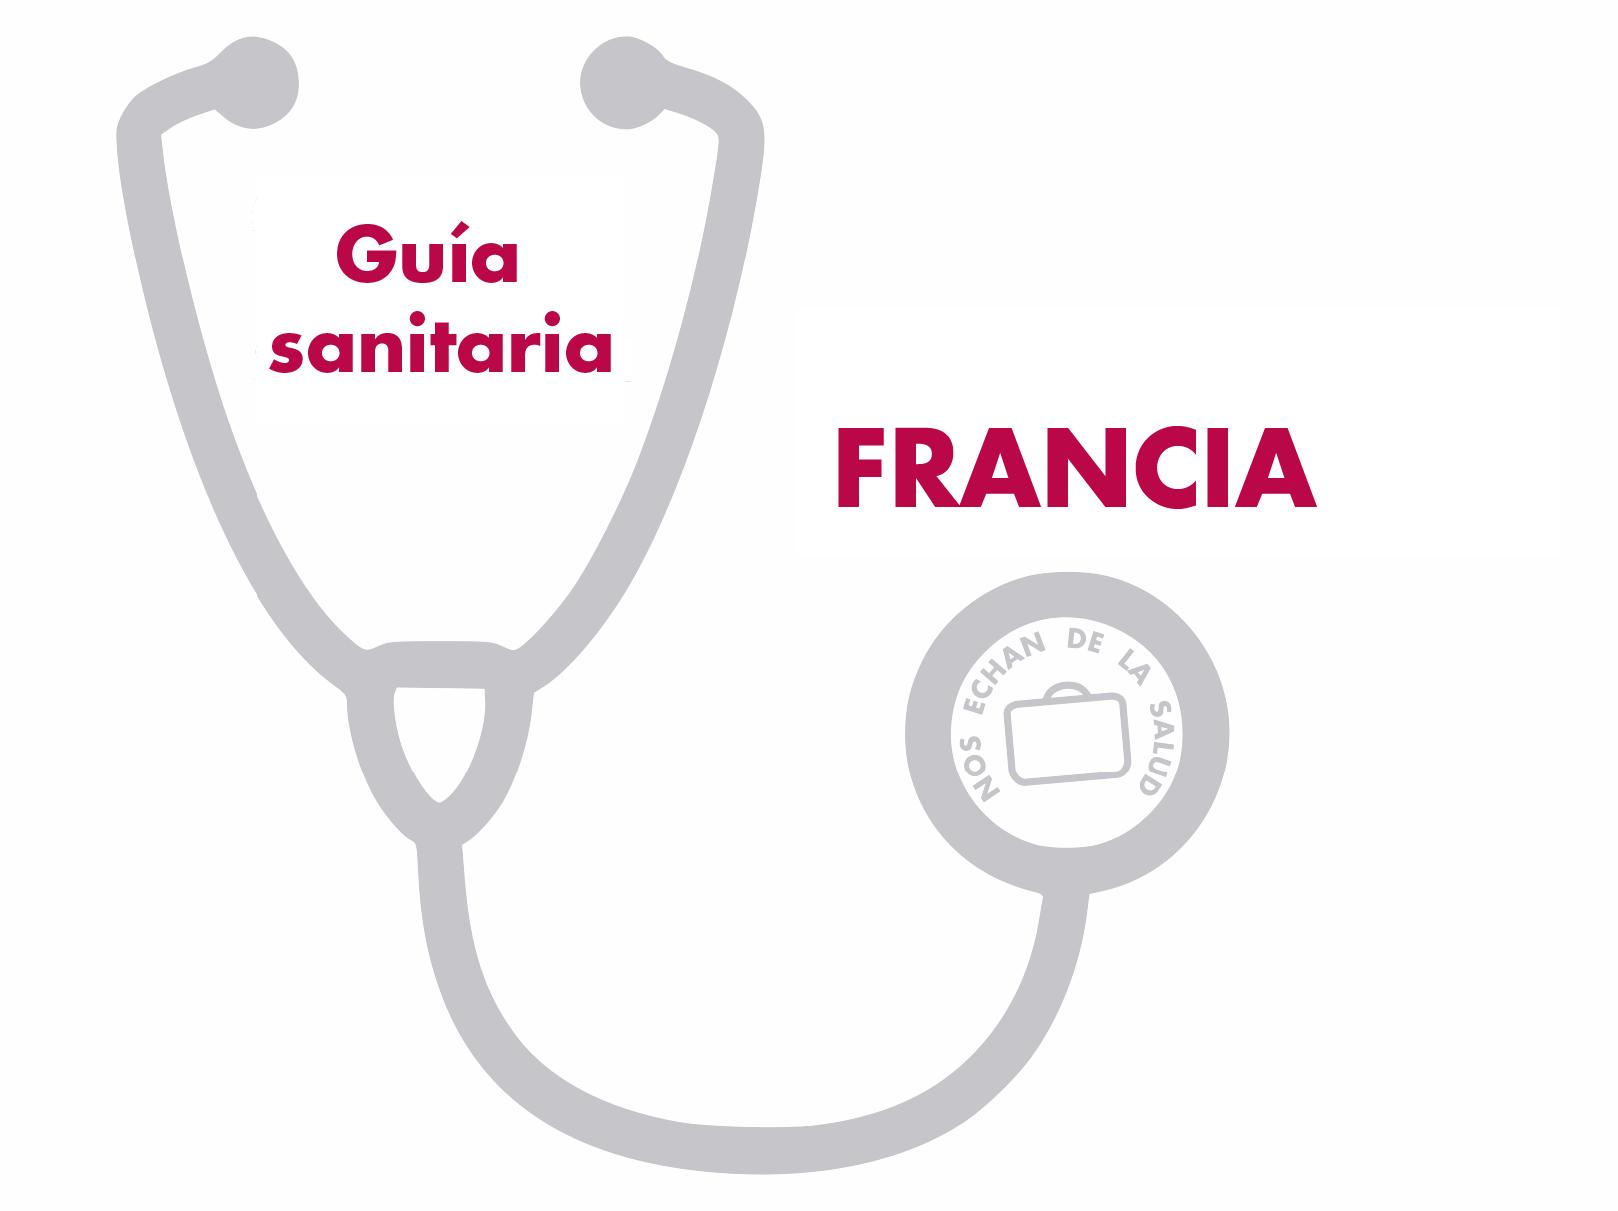 Guia Sanitaria Francia - Marea GranateMarea Granate